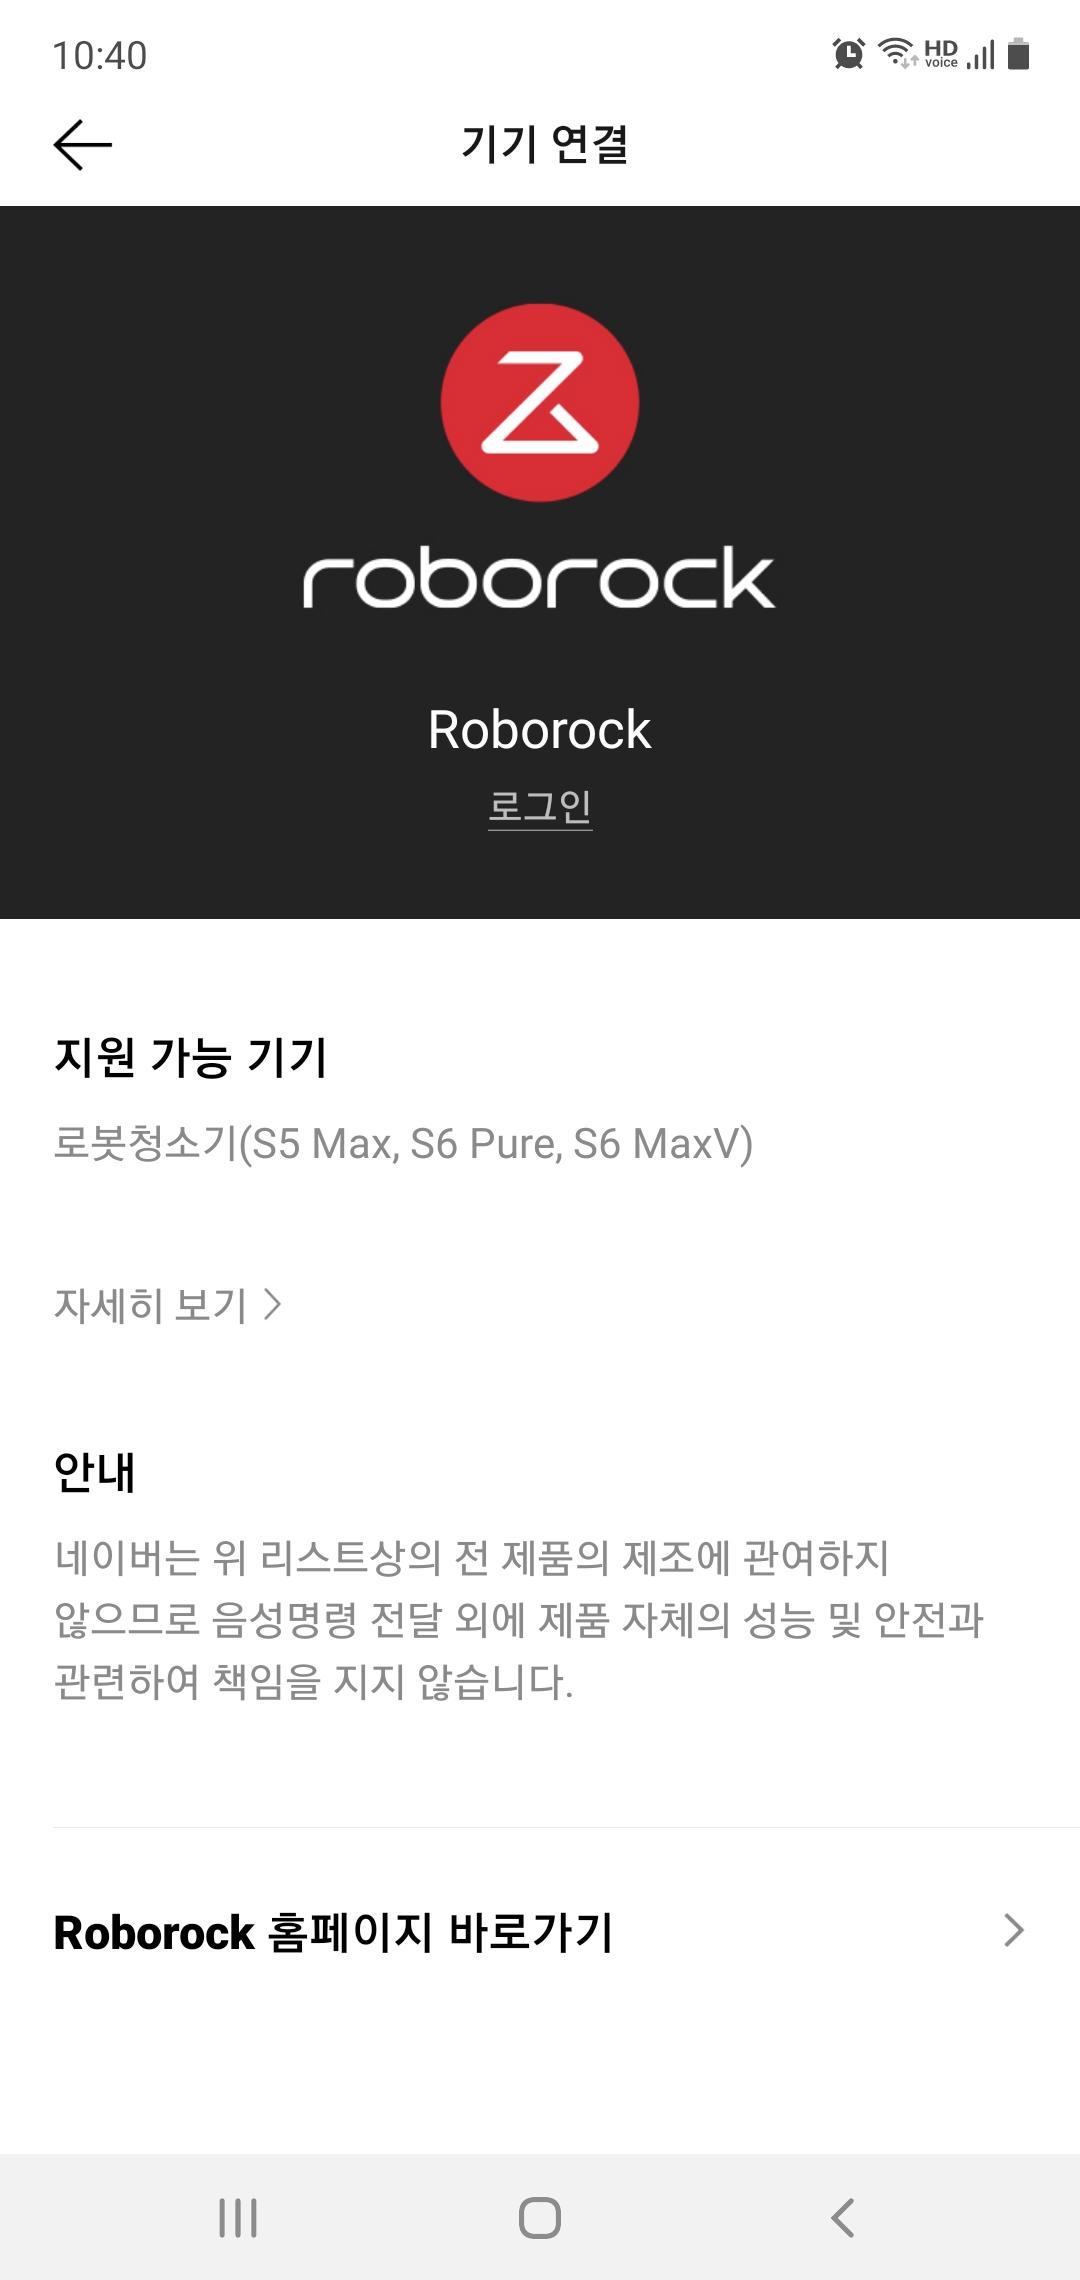 mb-file.php?path=2021%2F05%2F11%2FF3607_roborock.jpg